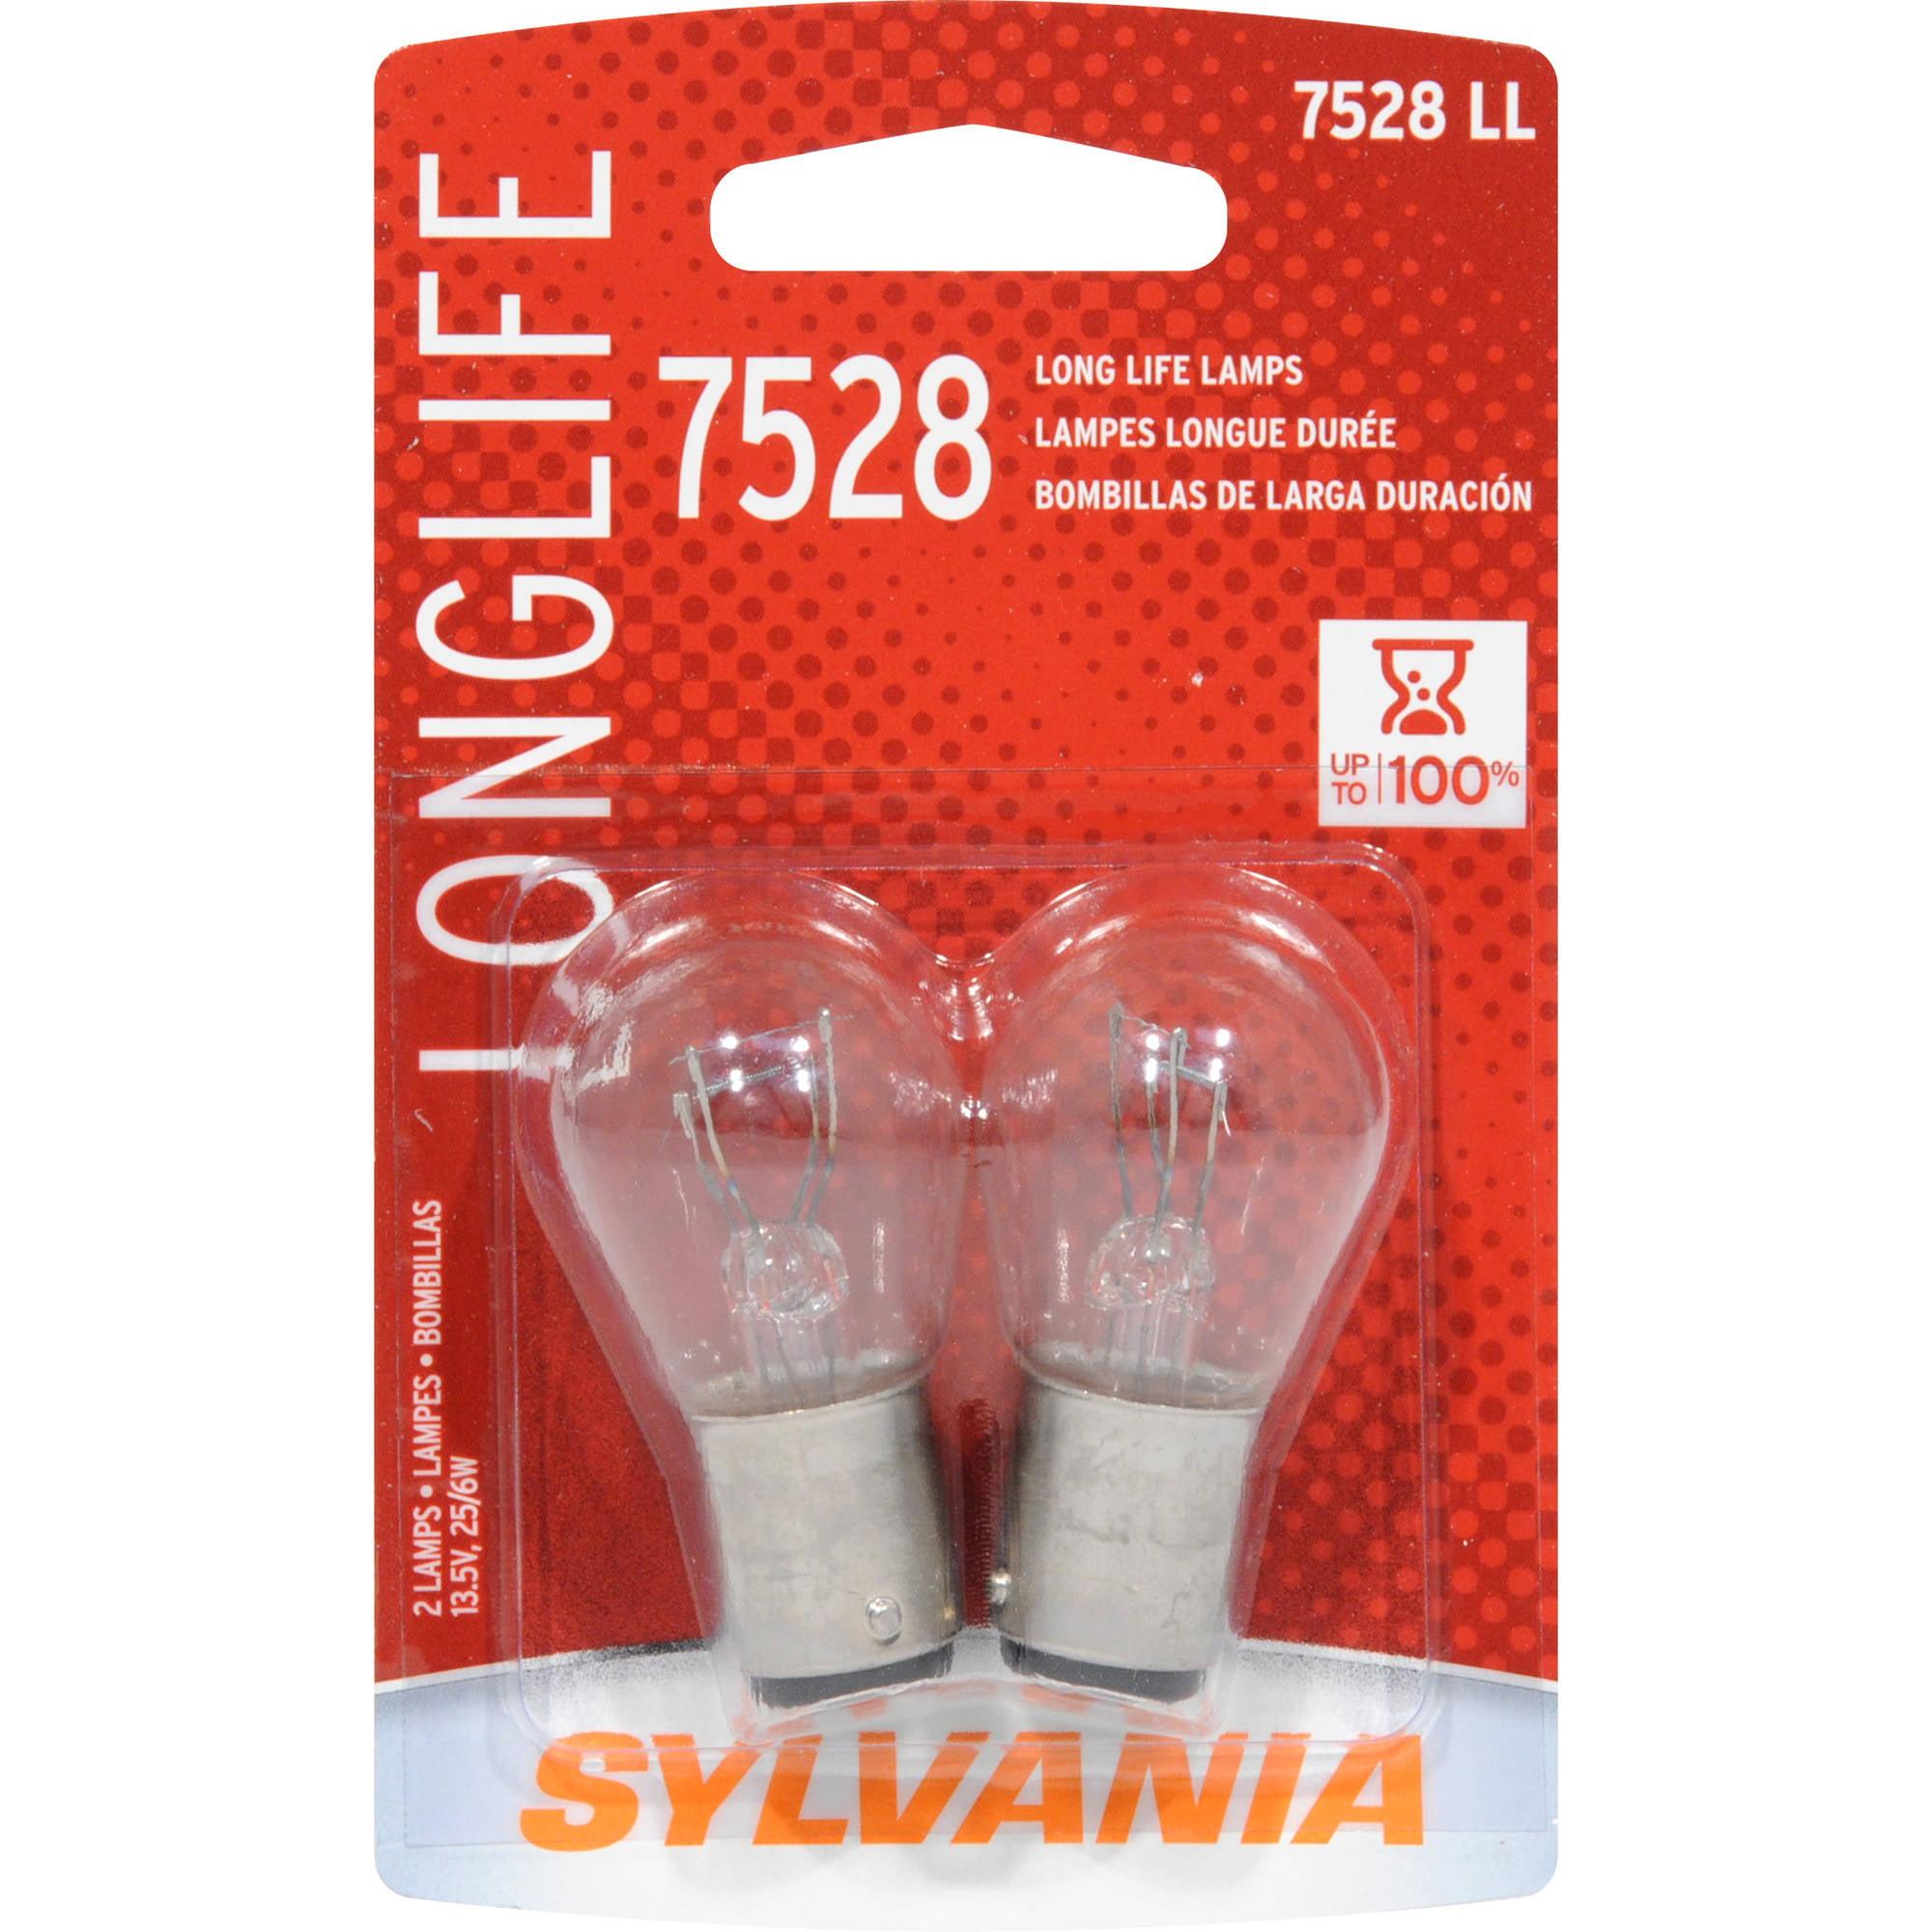 Sylvania 7528 Long-Life Miniature Bulb, Twin Pack